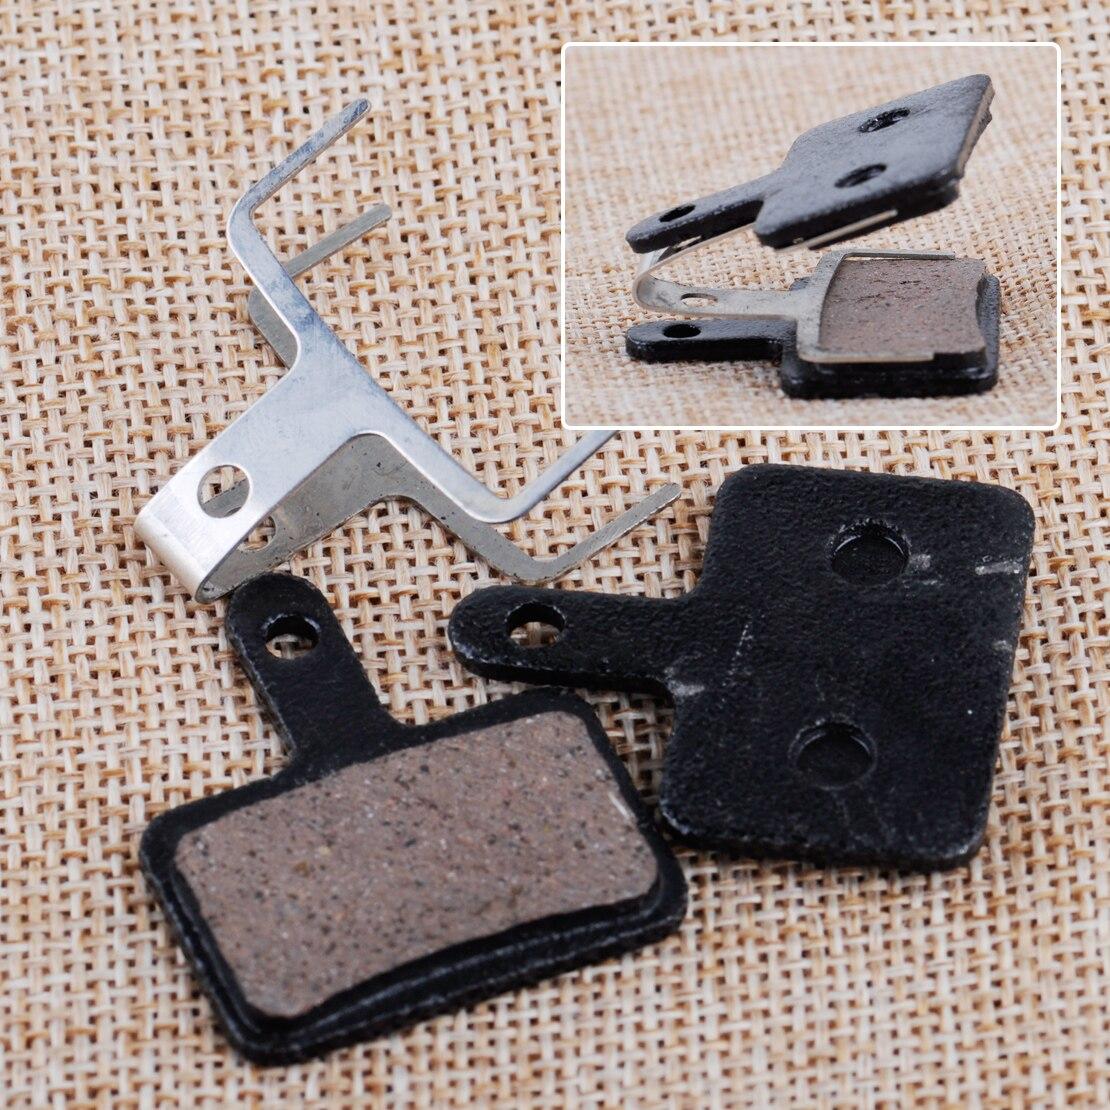 LETAOSK MTB Disc Brake Pads B01S Fit For Shimano M446 M416 M485 M475 M525 M575 BR-T615 BR-T675 BR-C501 BR-M375 BR-M395 BR-M415